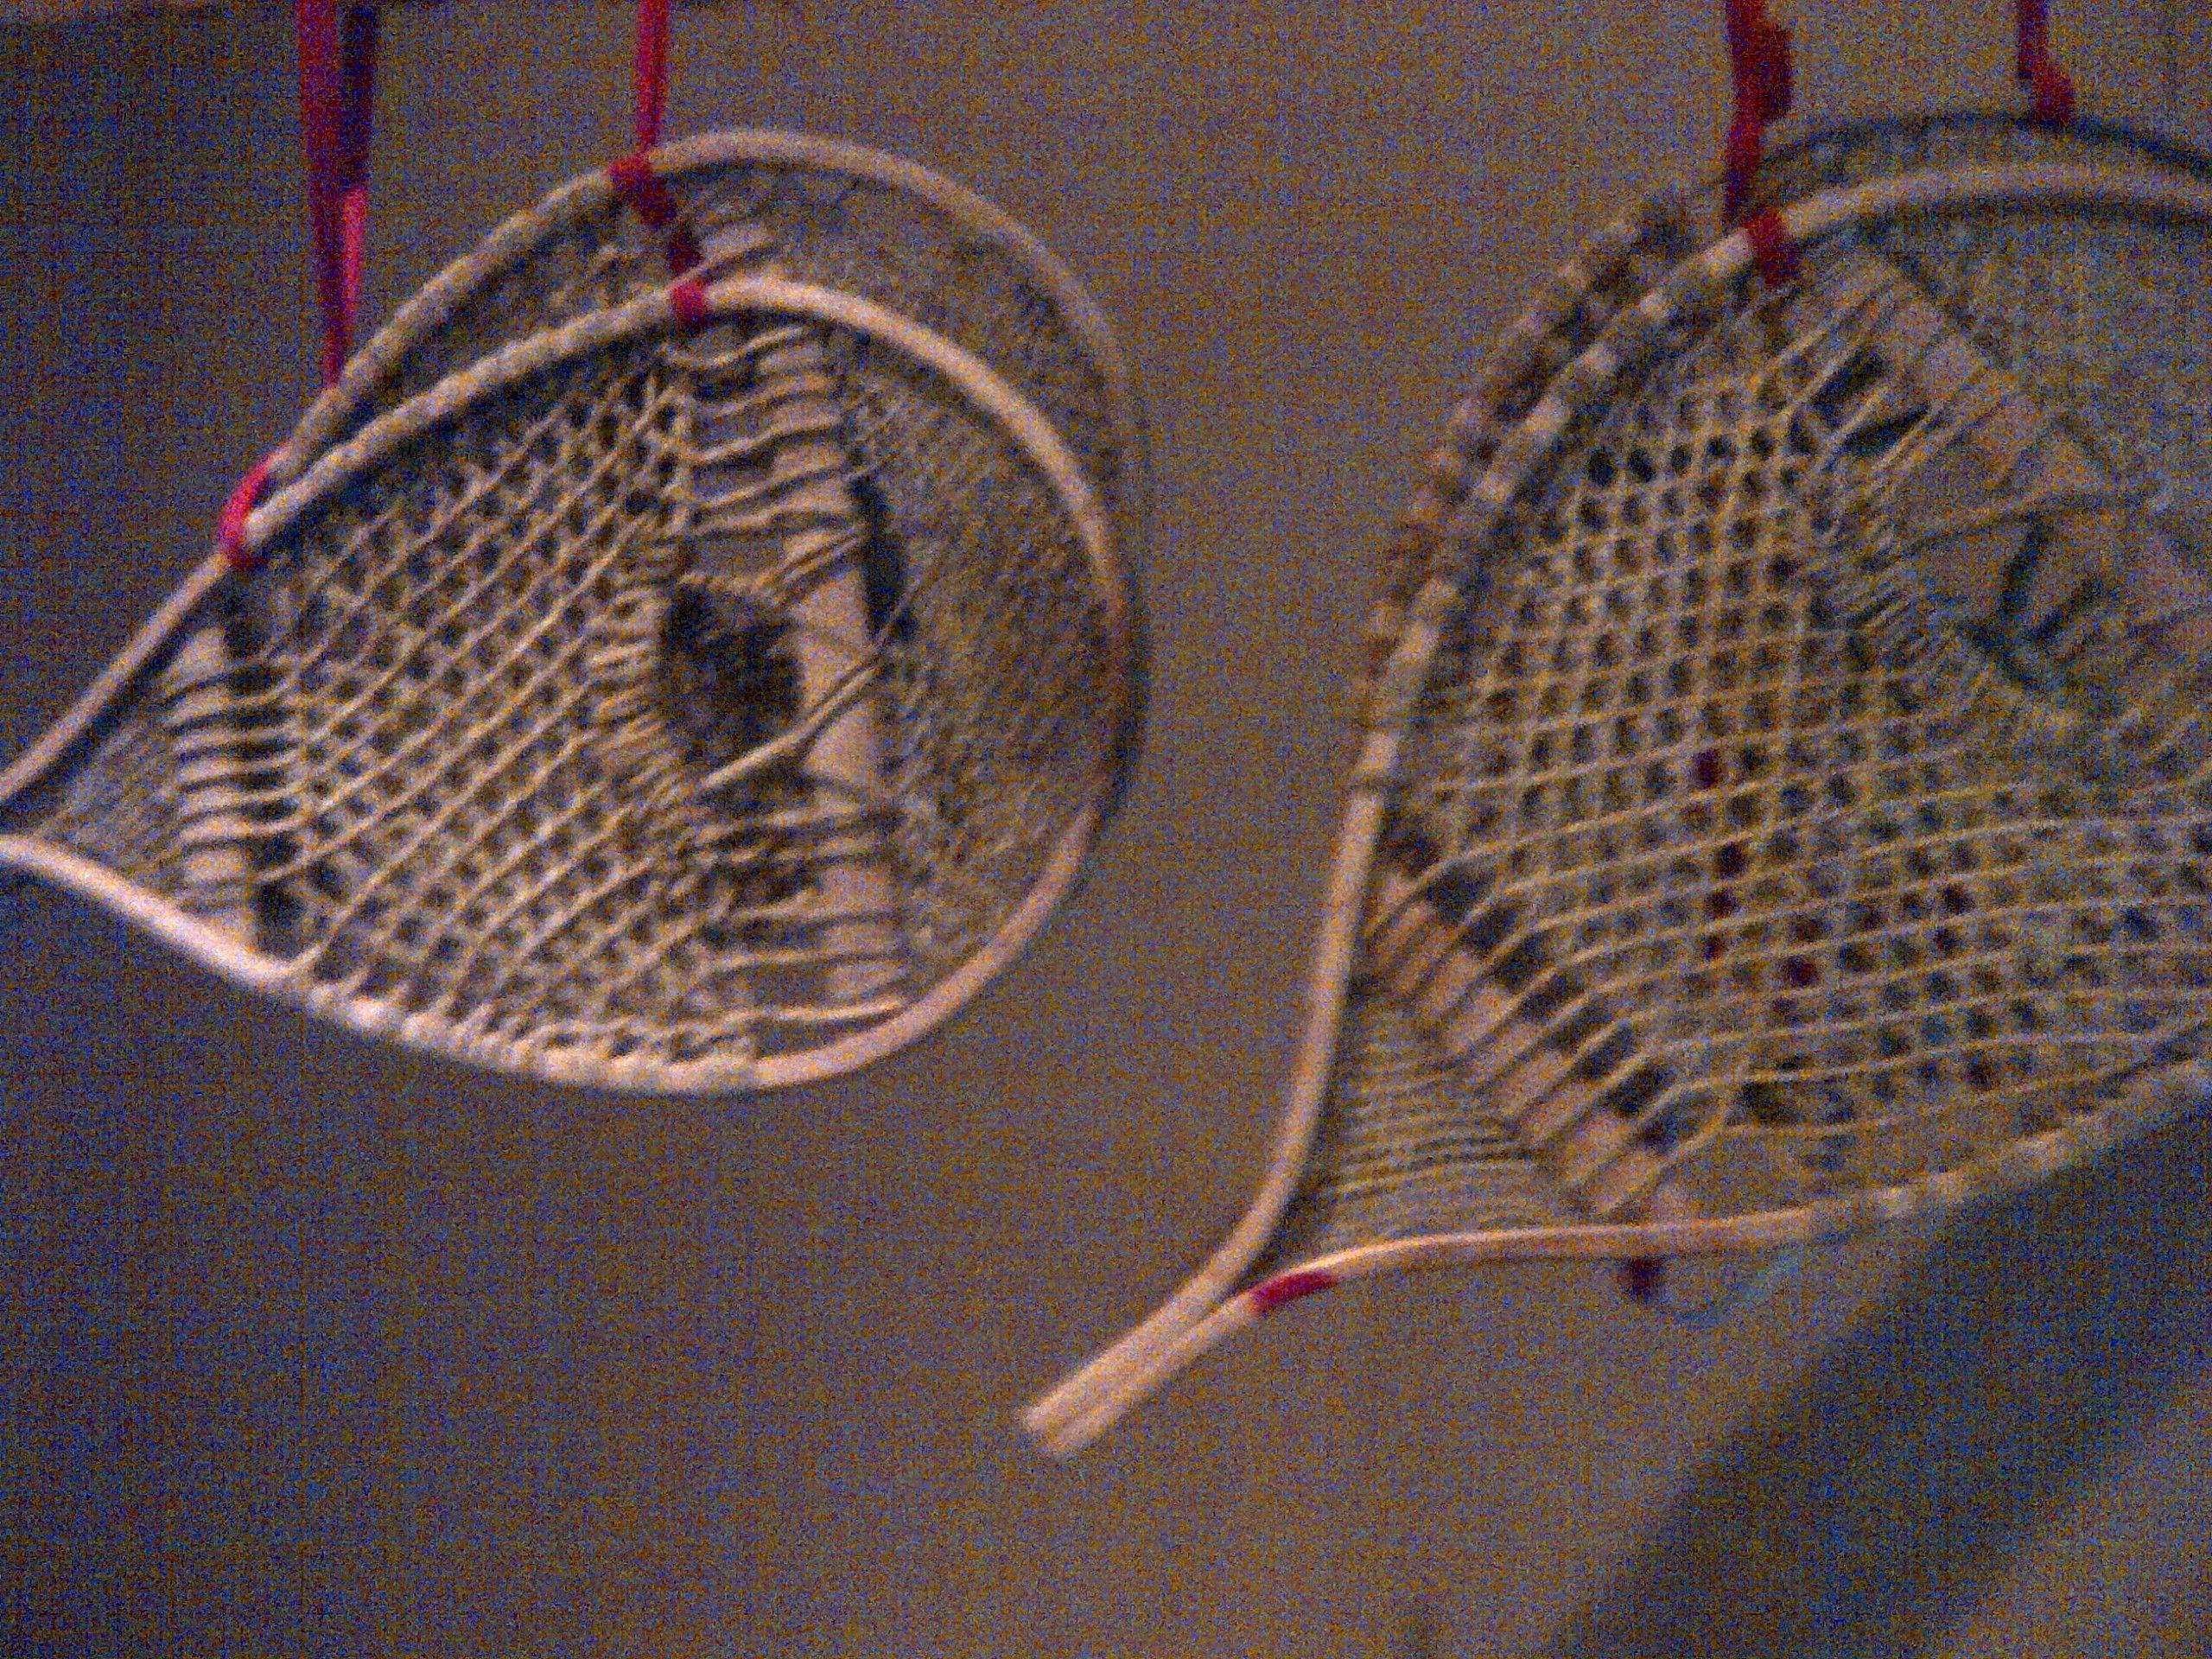 Snowshoeing Aboriginal Innu Lac Saint Jean With Images Aboriginal Tennis Racket Culture